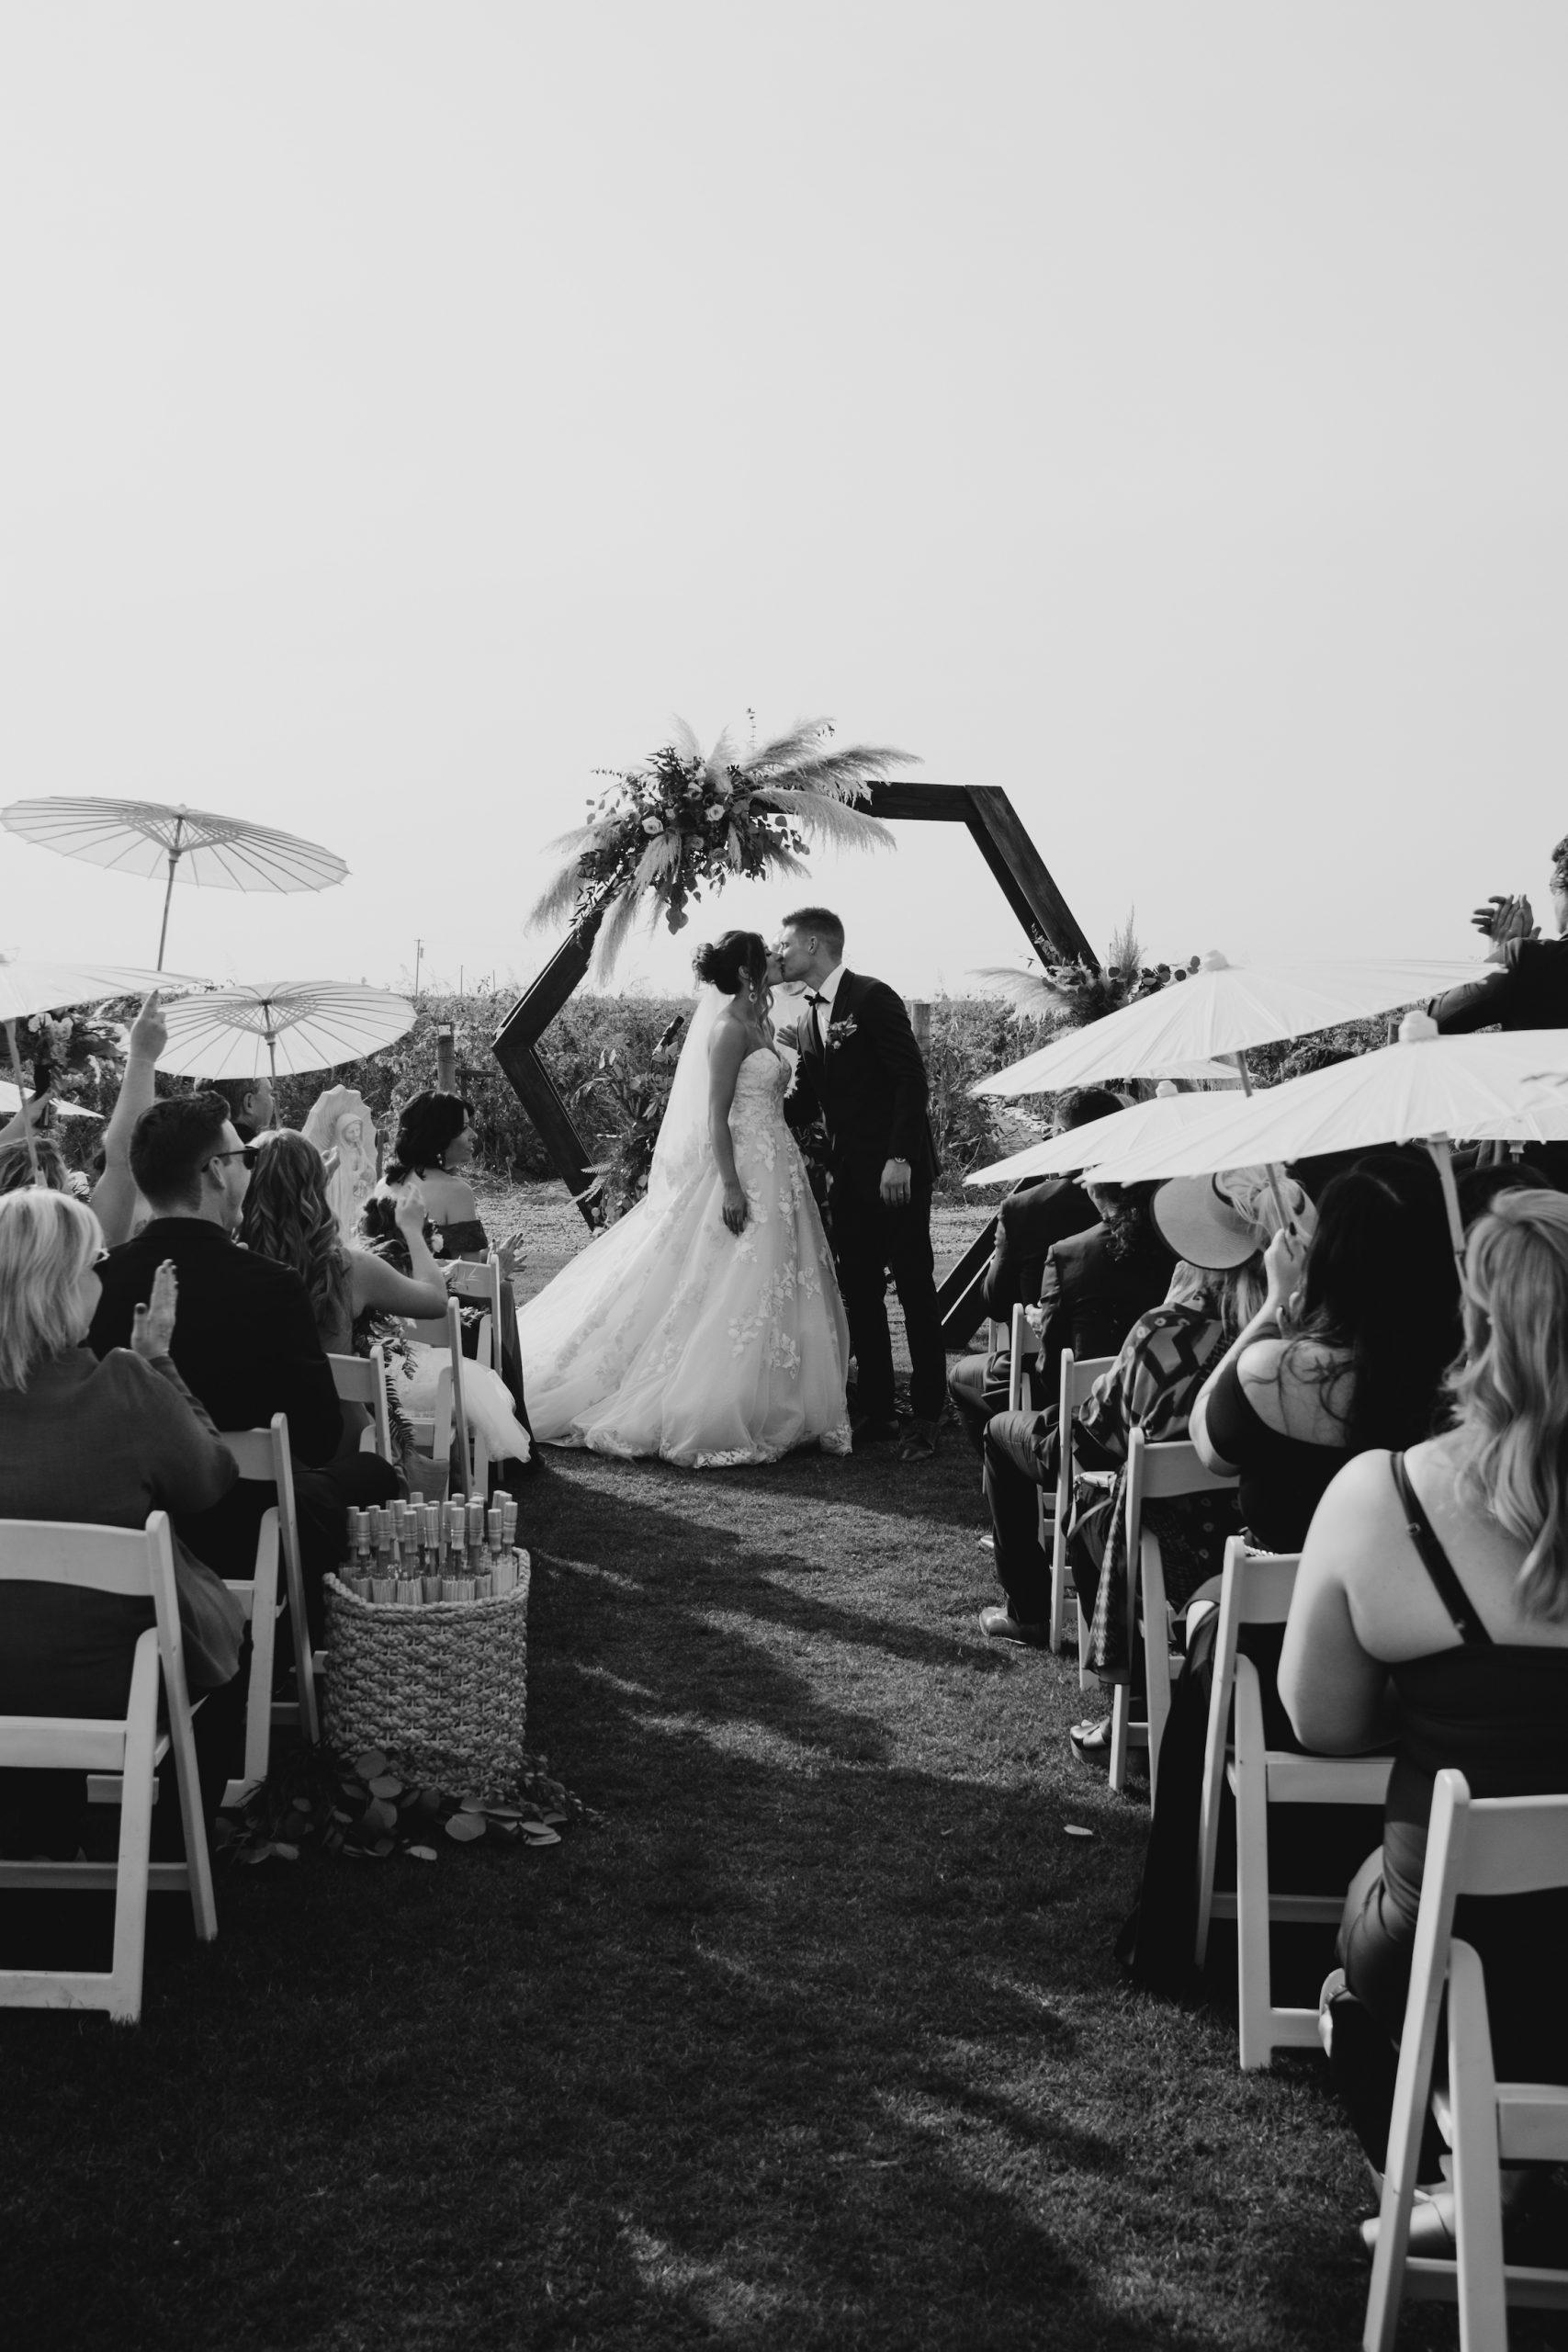 Evanelle Vineyards Wedding Ceremony, image by Fatima Elreda Photo